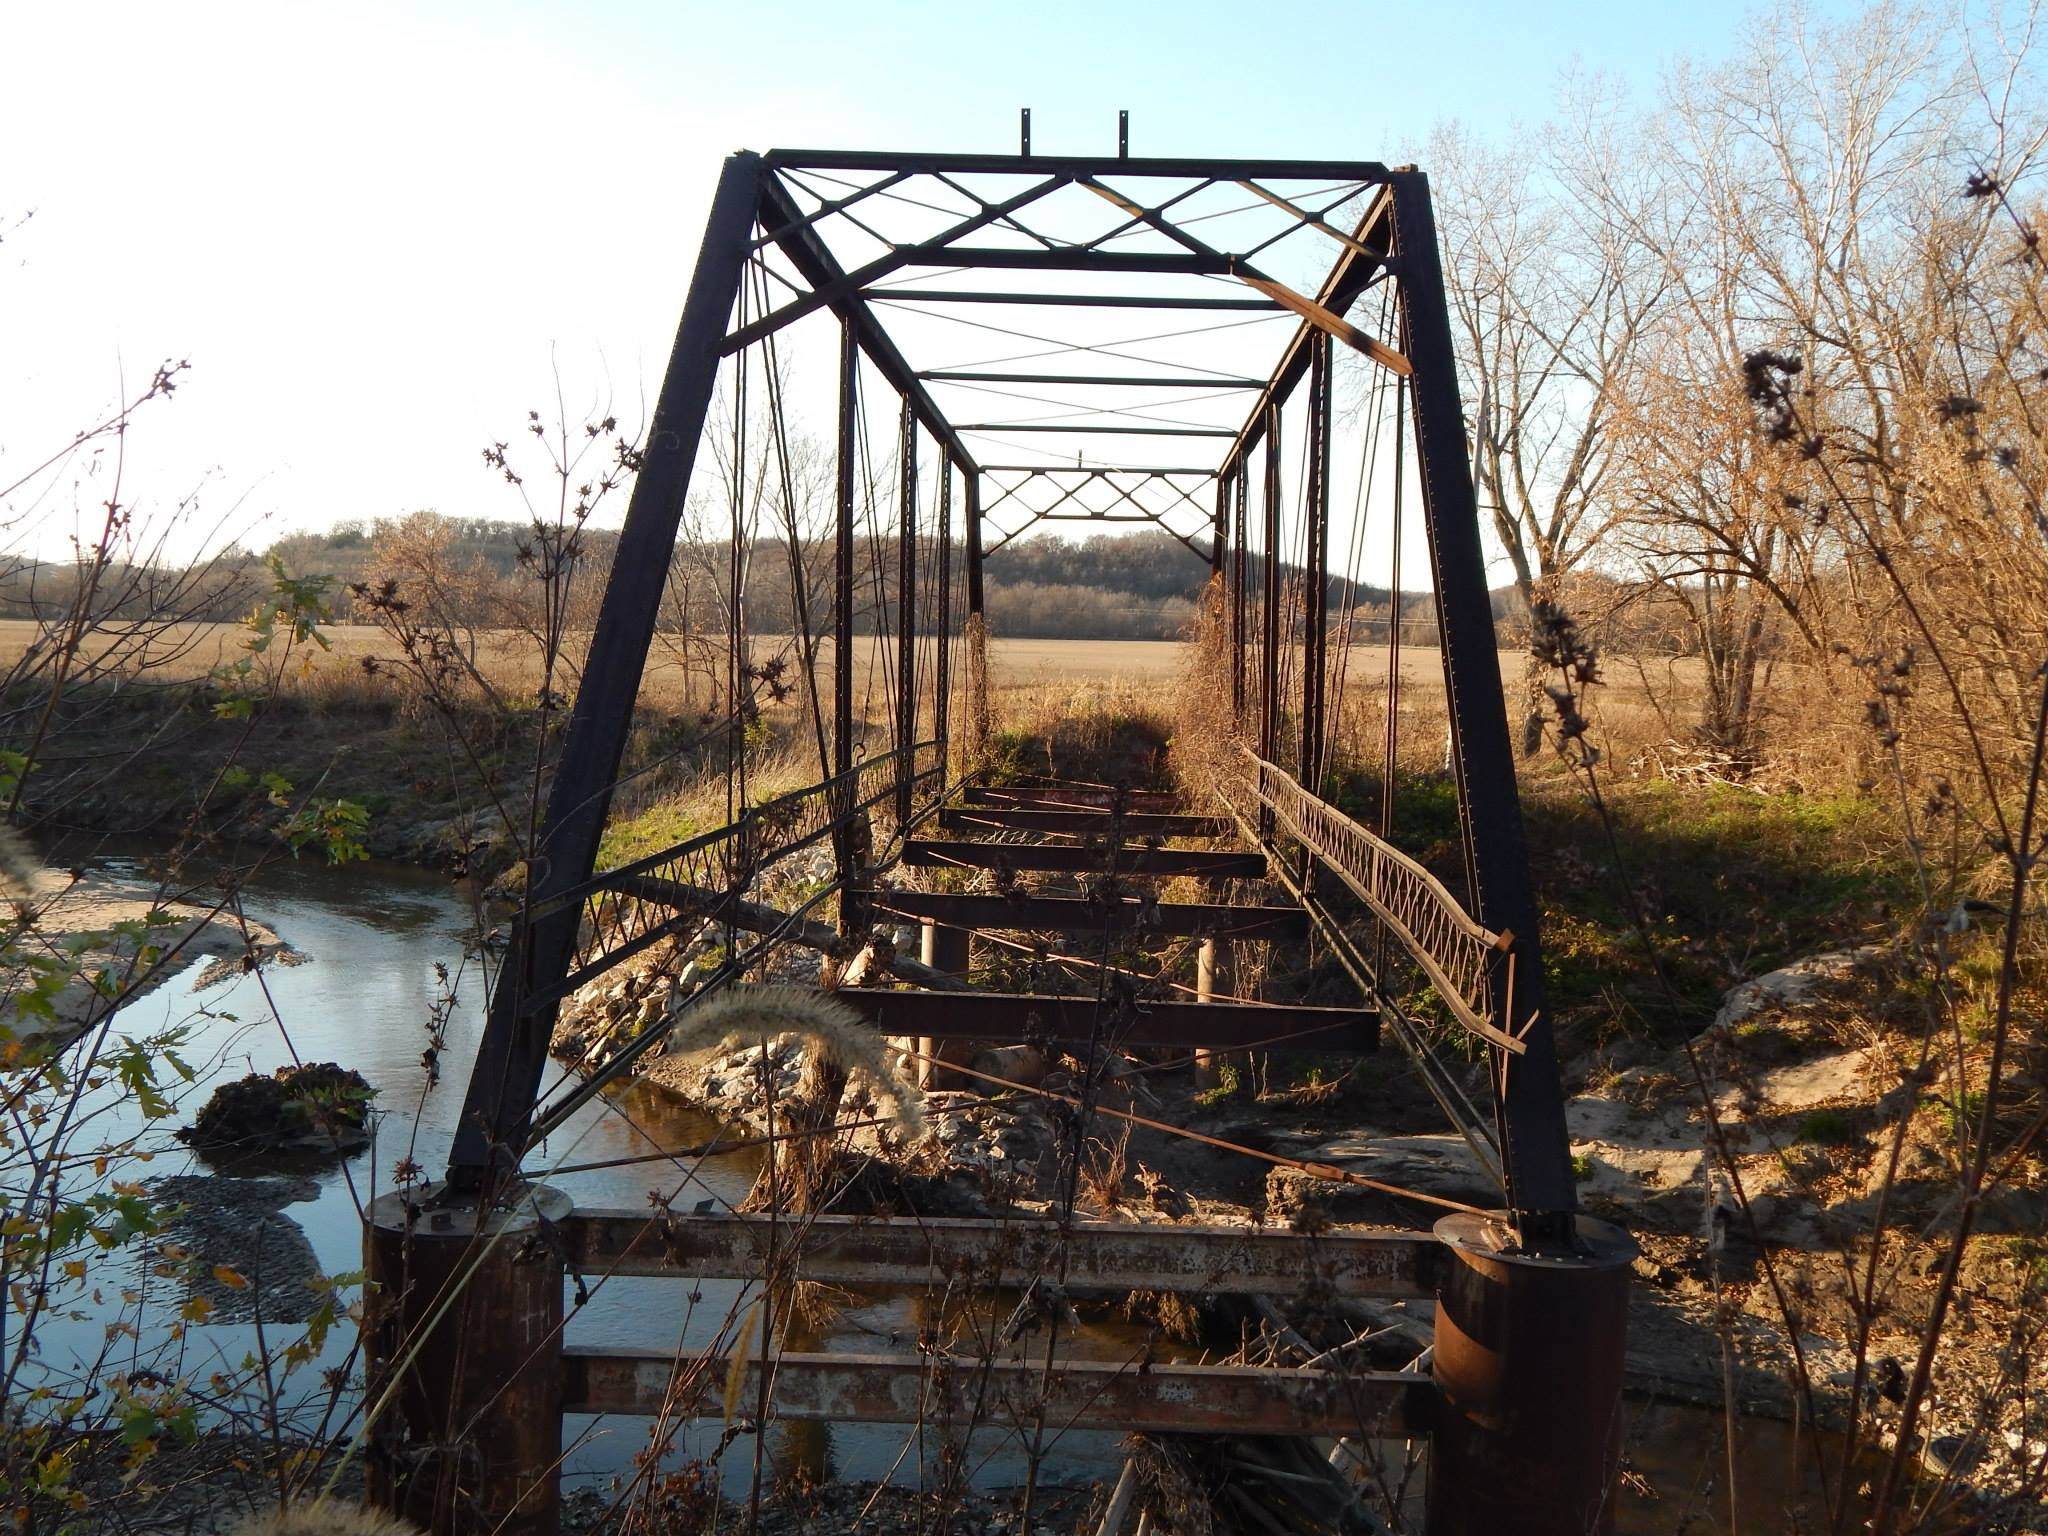 Huston Bridge over Clancy Creek. Photo taken by Mitch Nicholson